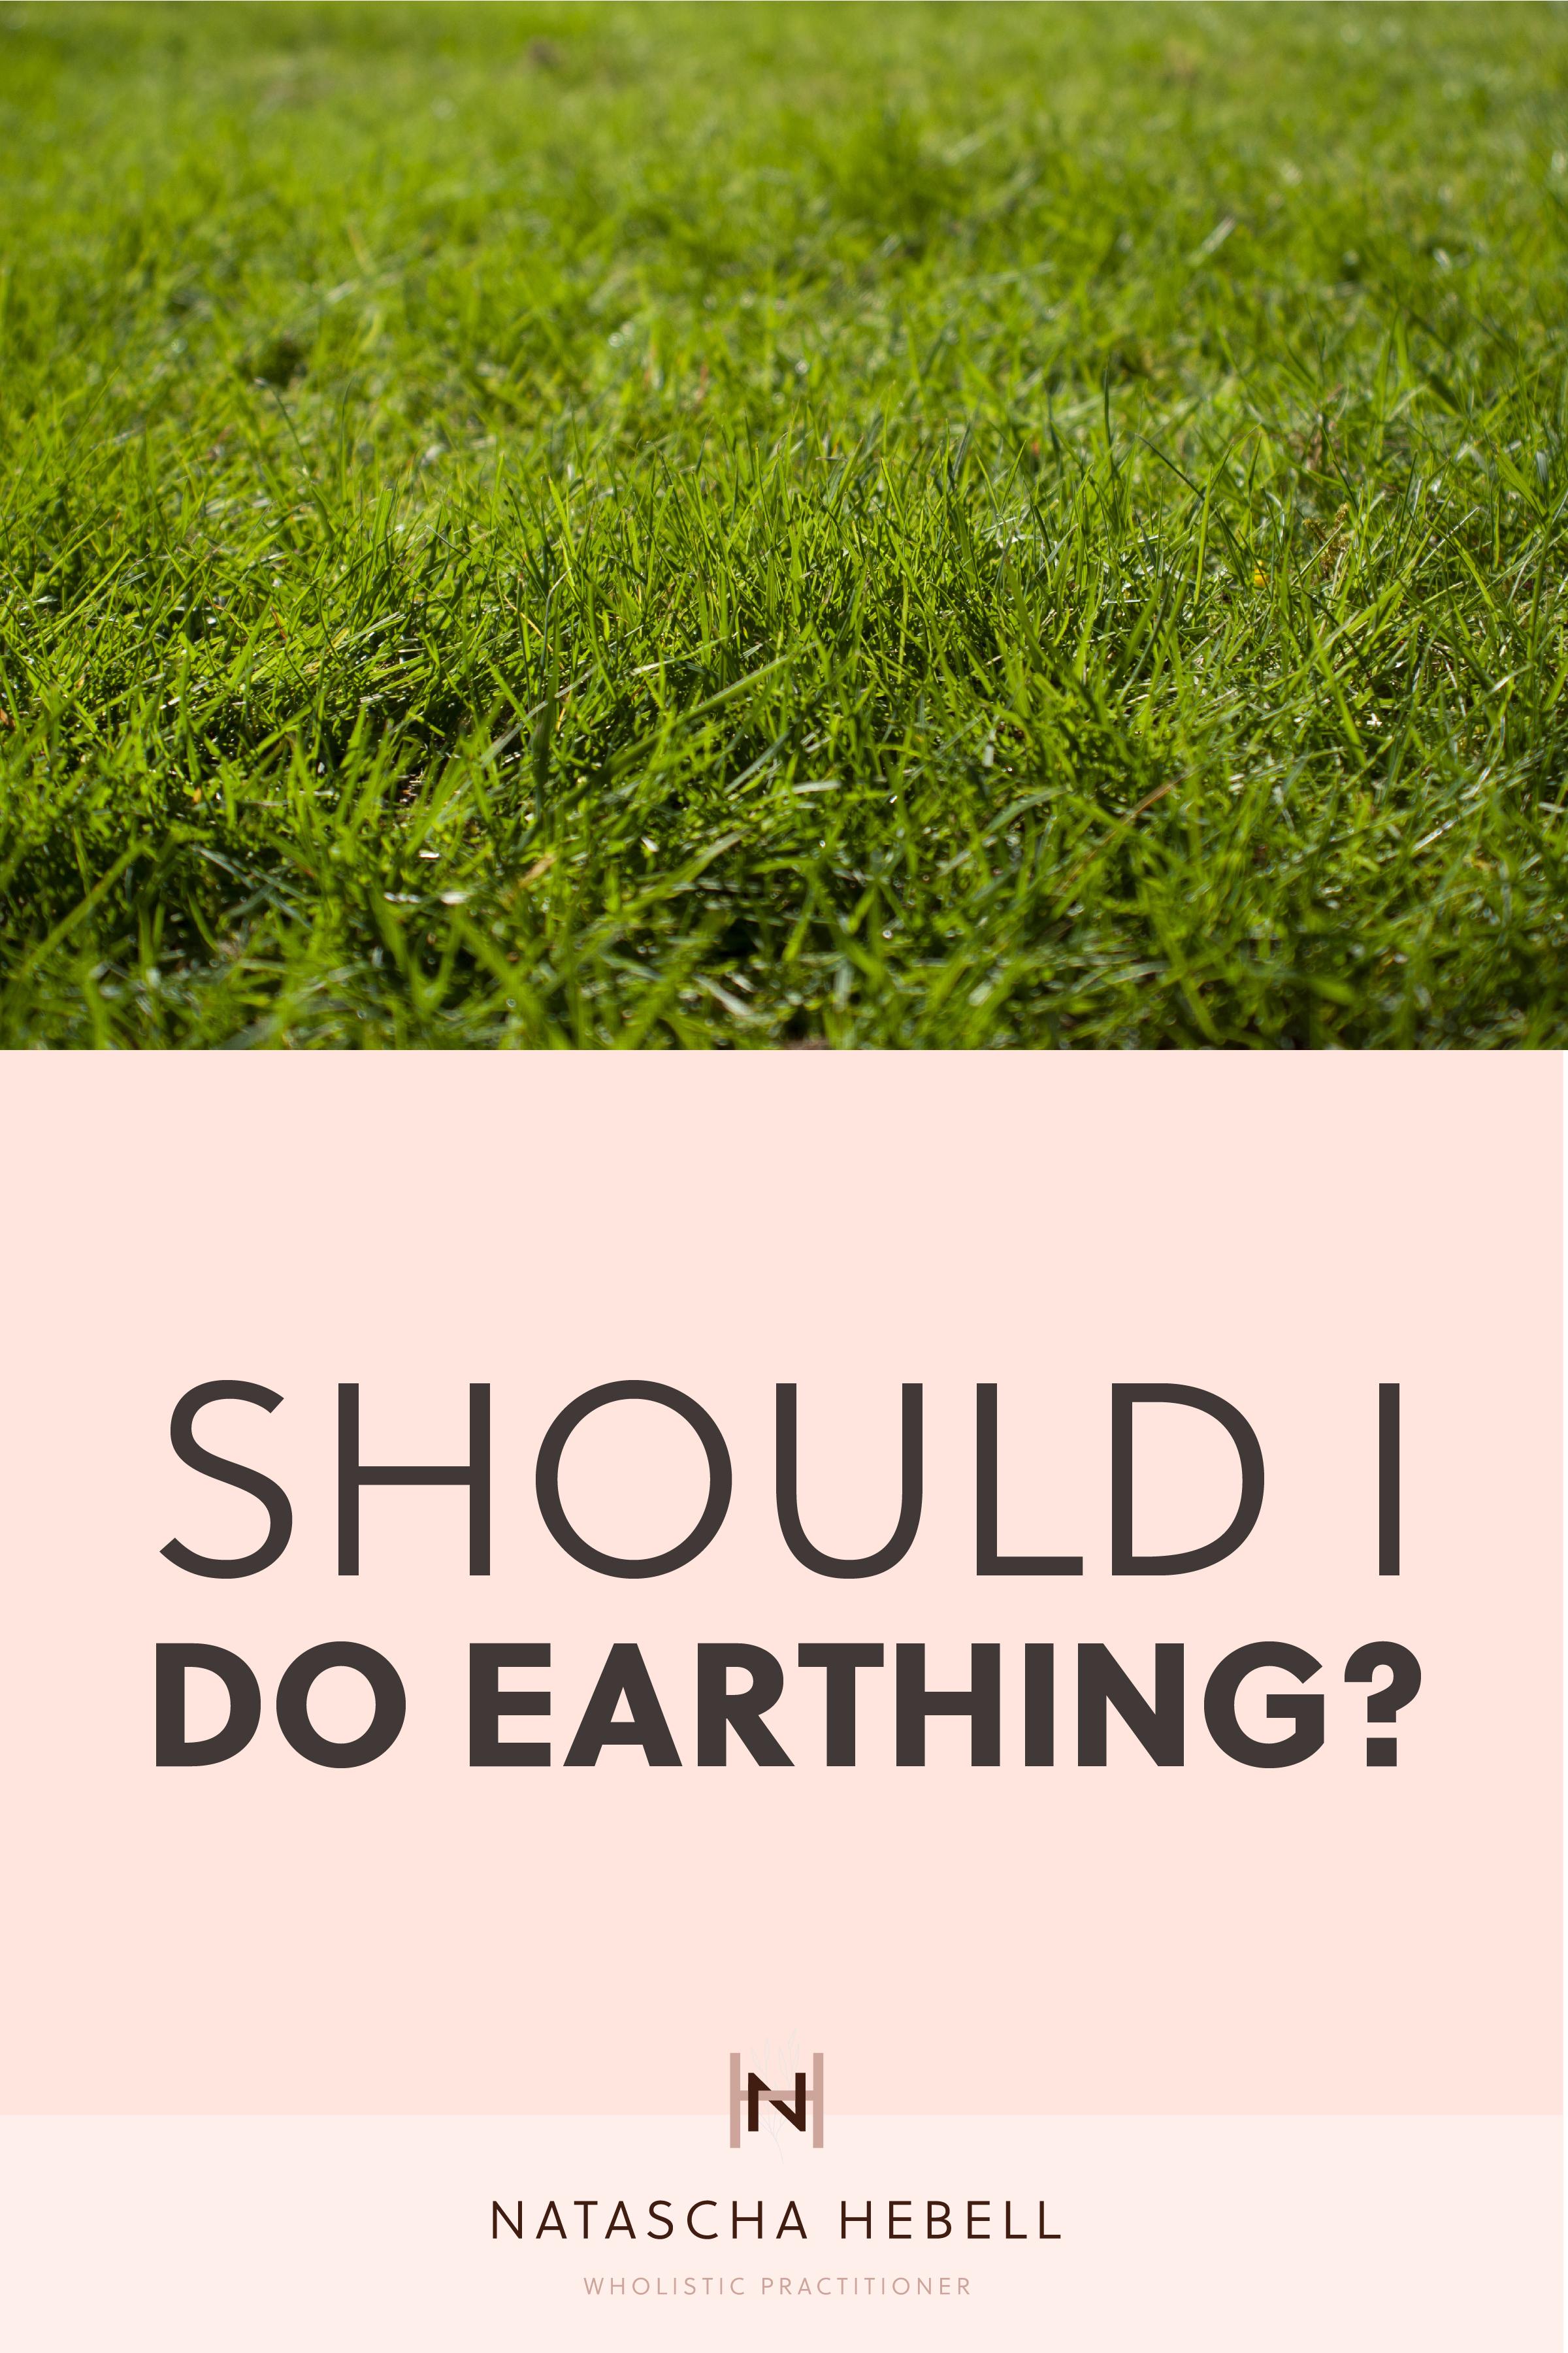 Should I do earthing?   Natascha Hebell, Wholistic Practitioner